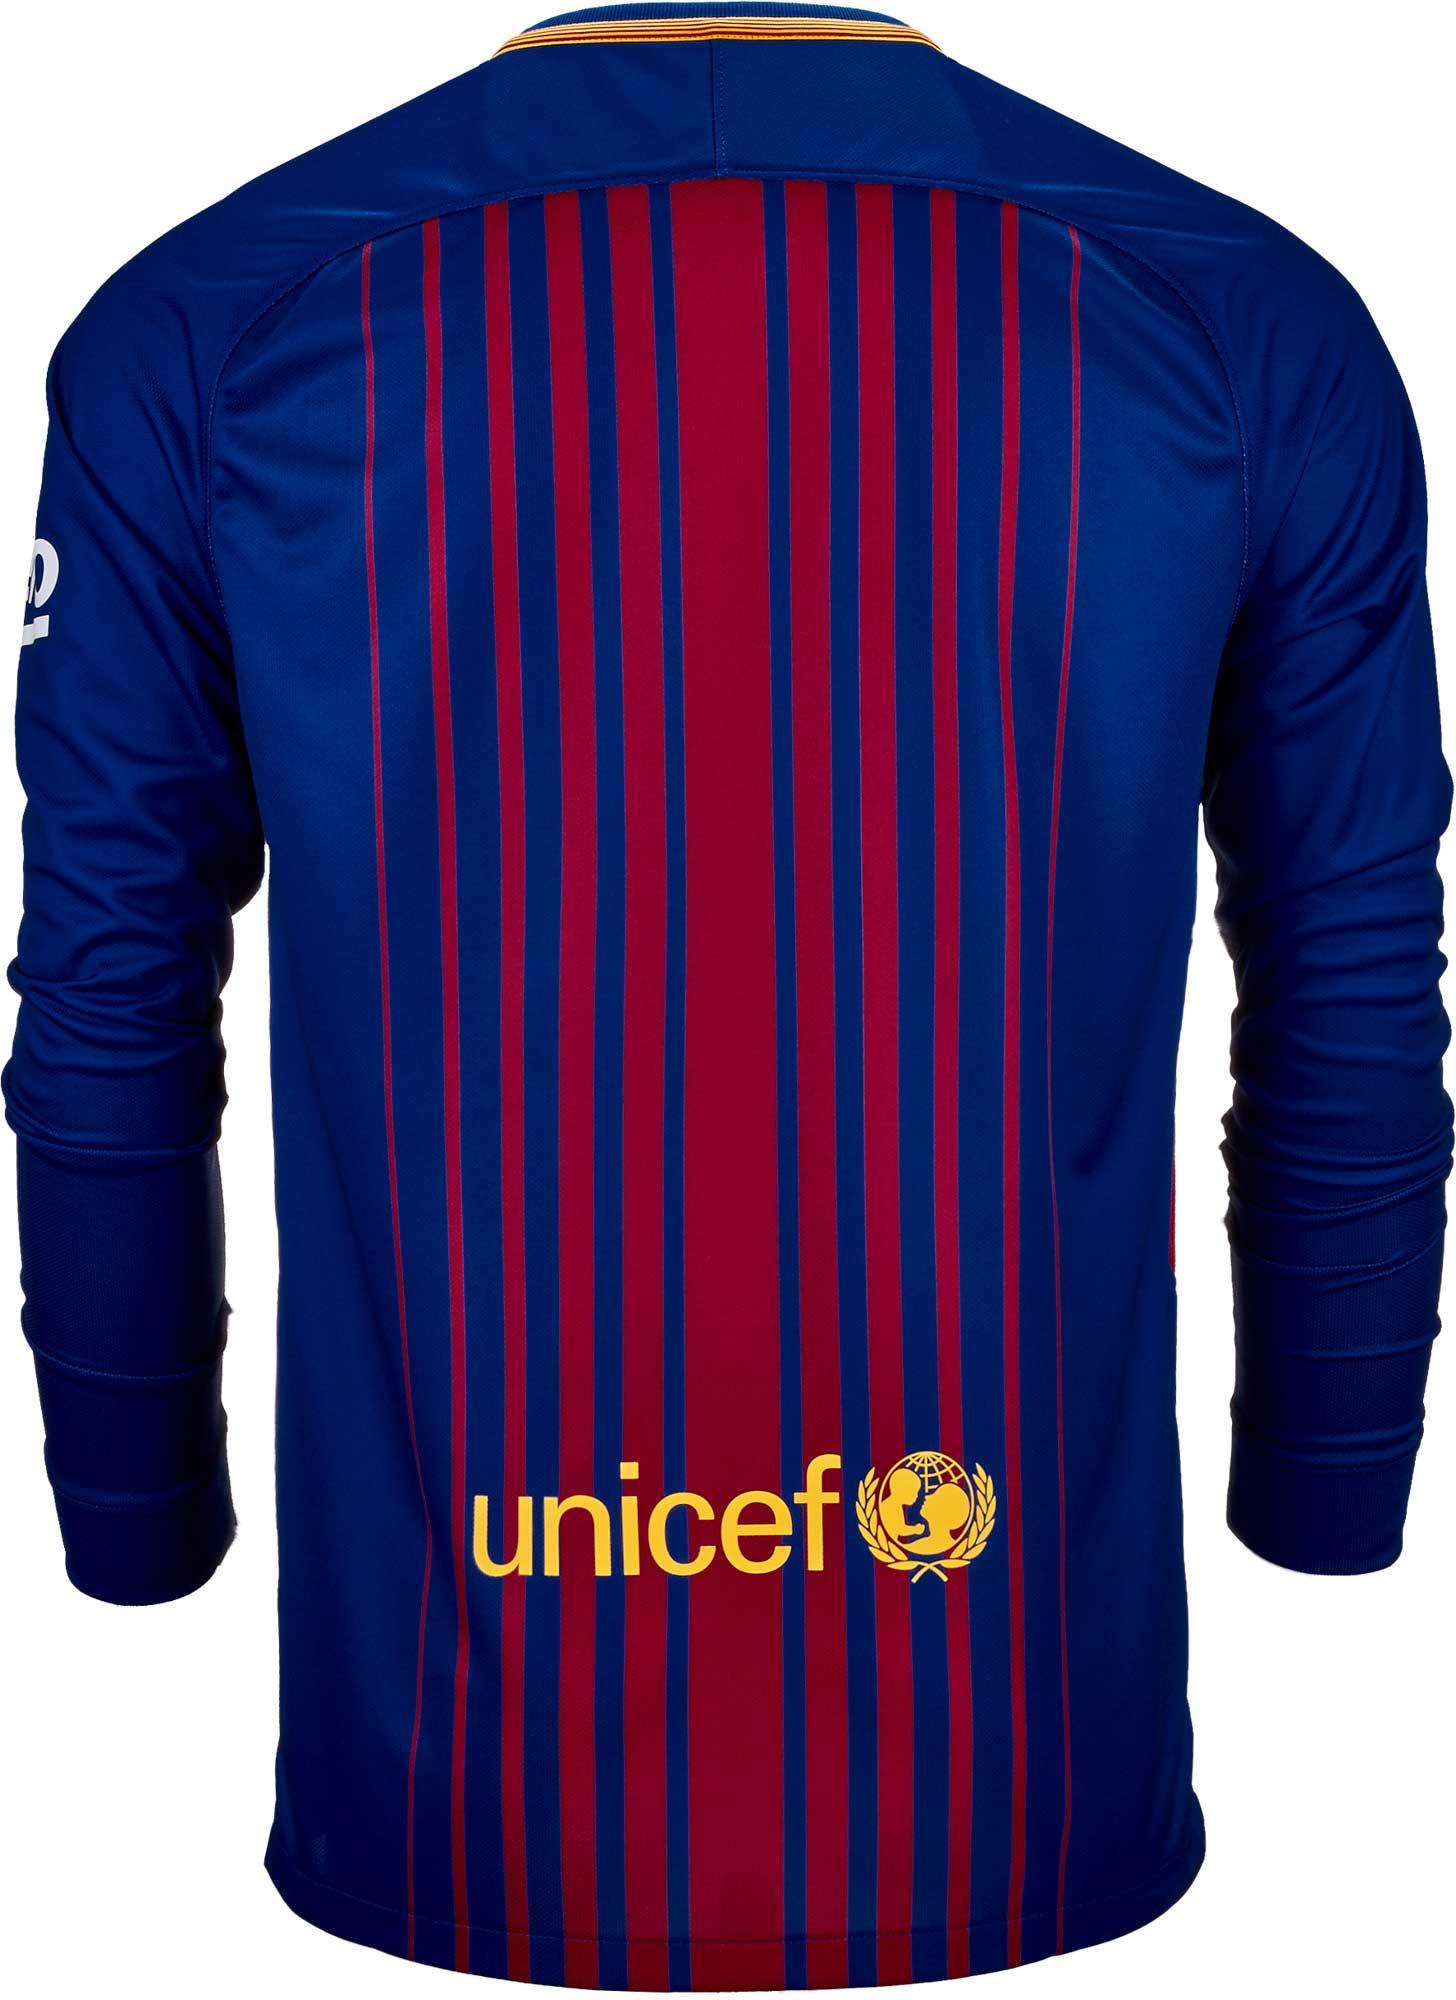 83157ed58 2017 18 Nike Barcelona Home L S Jersey - SoccerPro.com